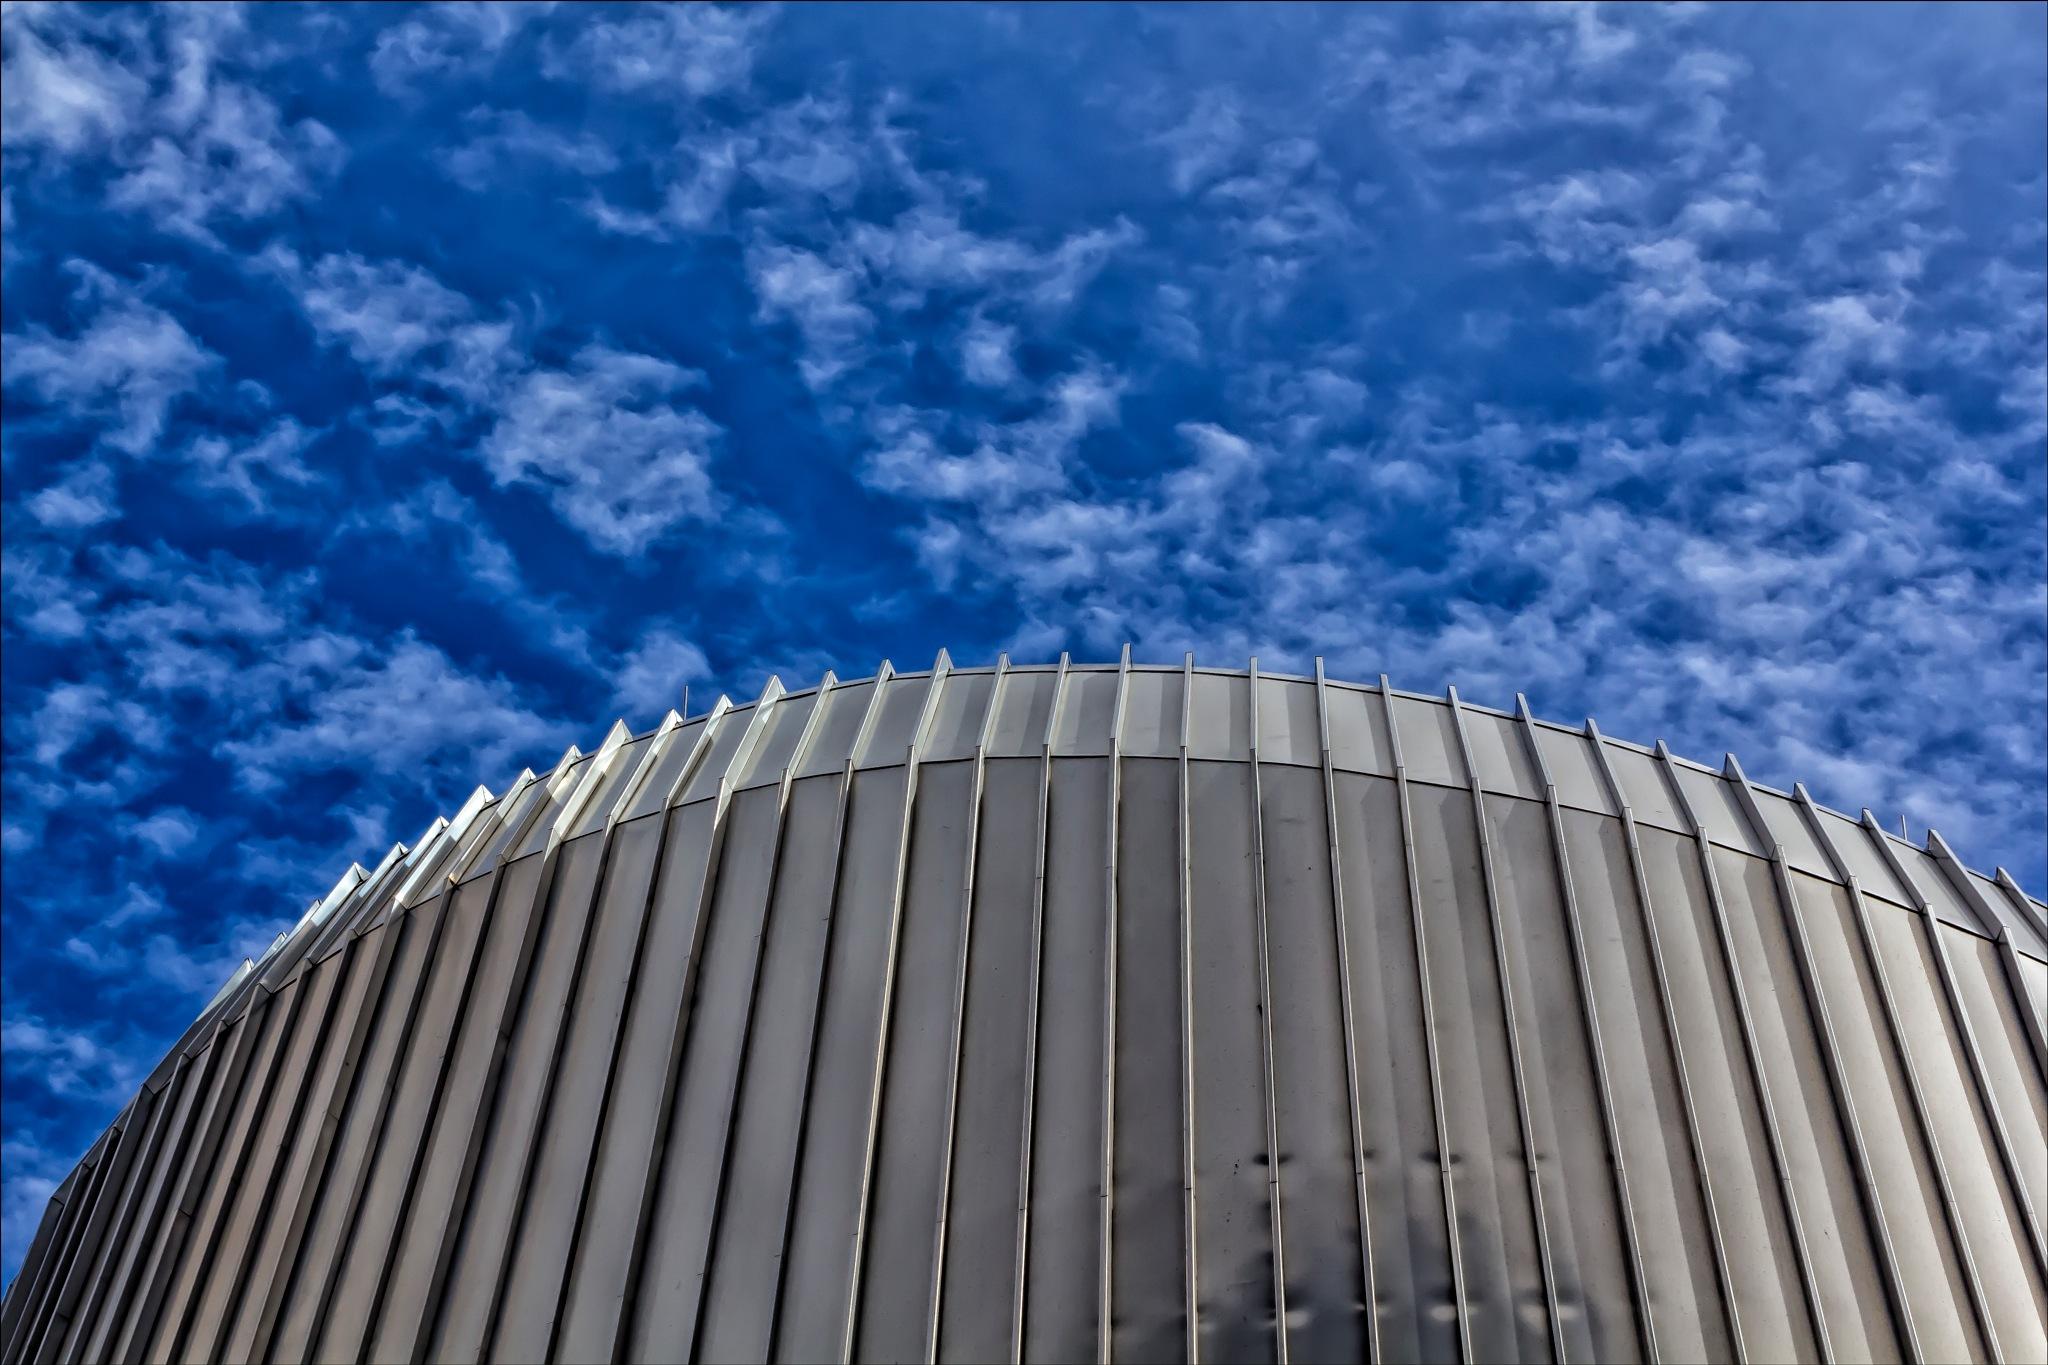 Metal Dome by robertullmann